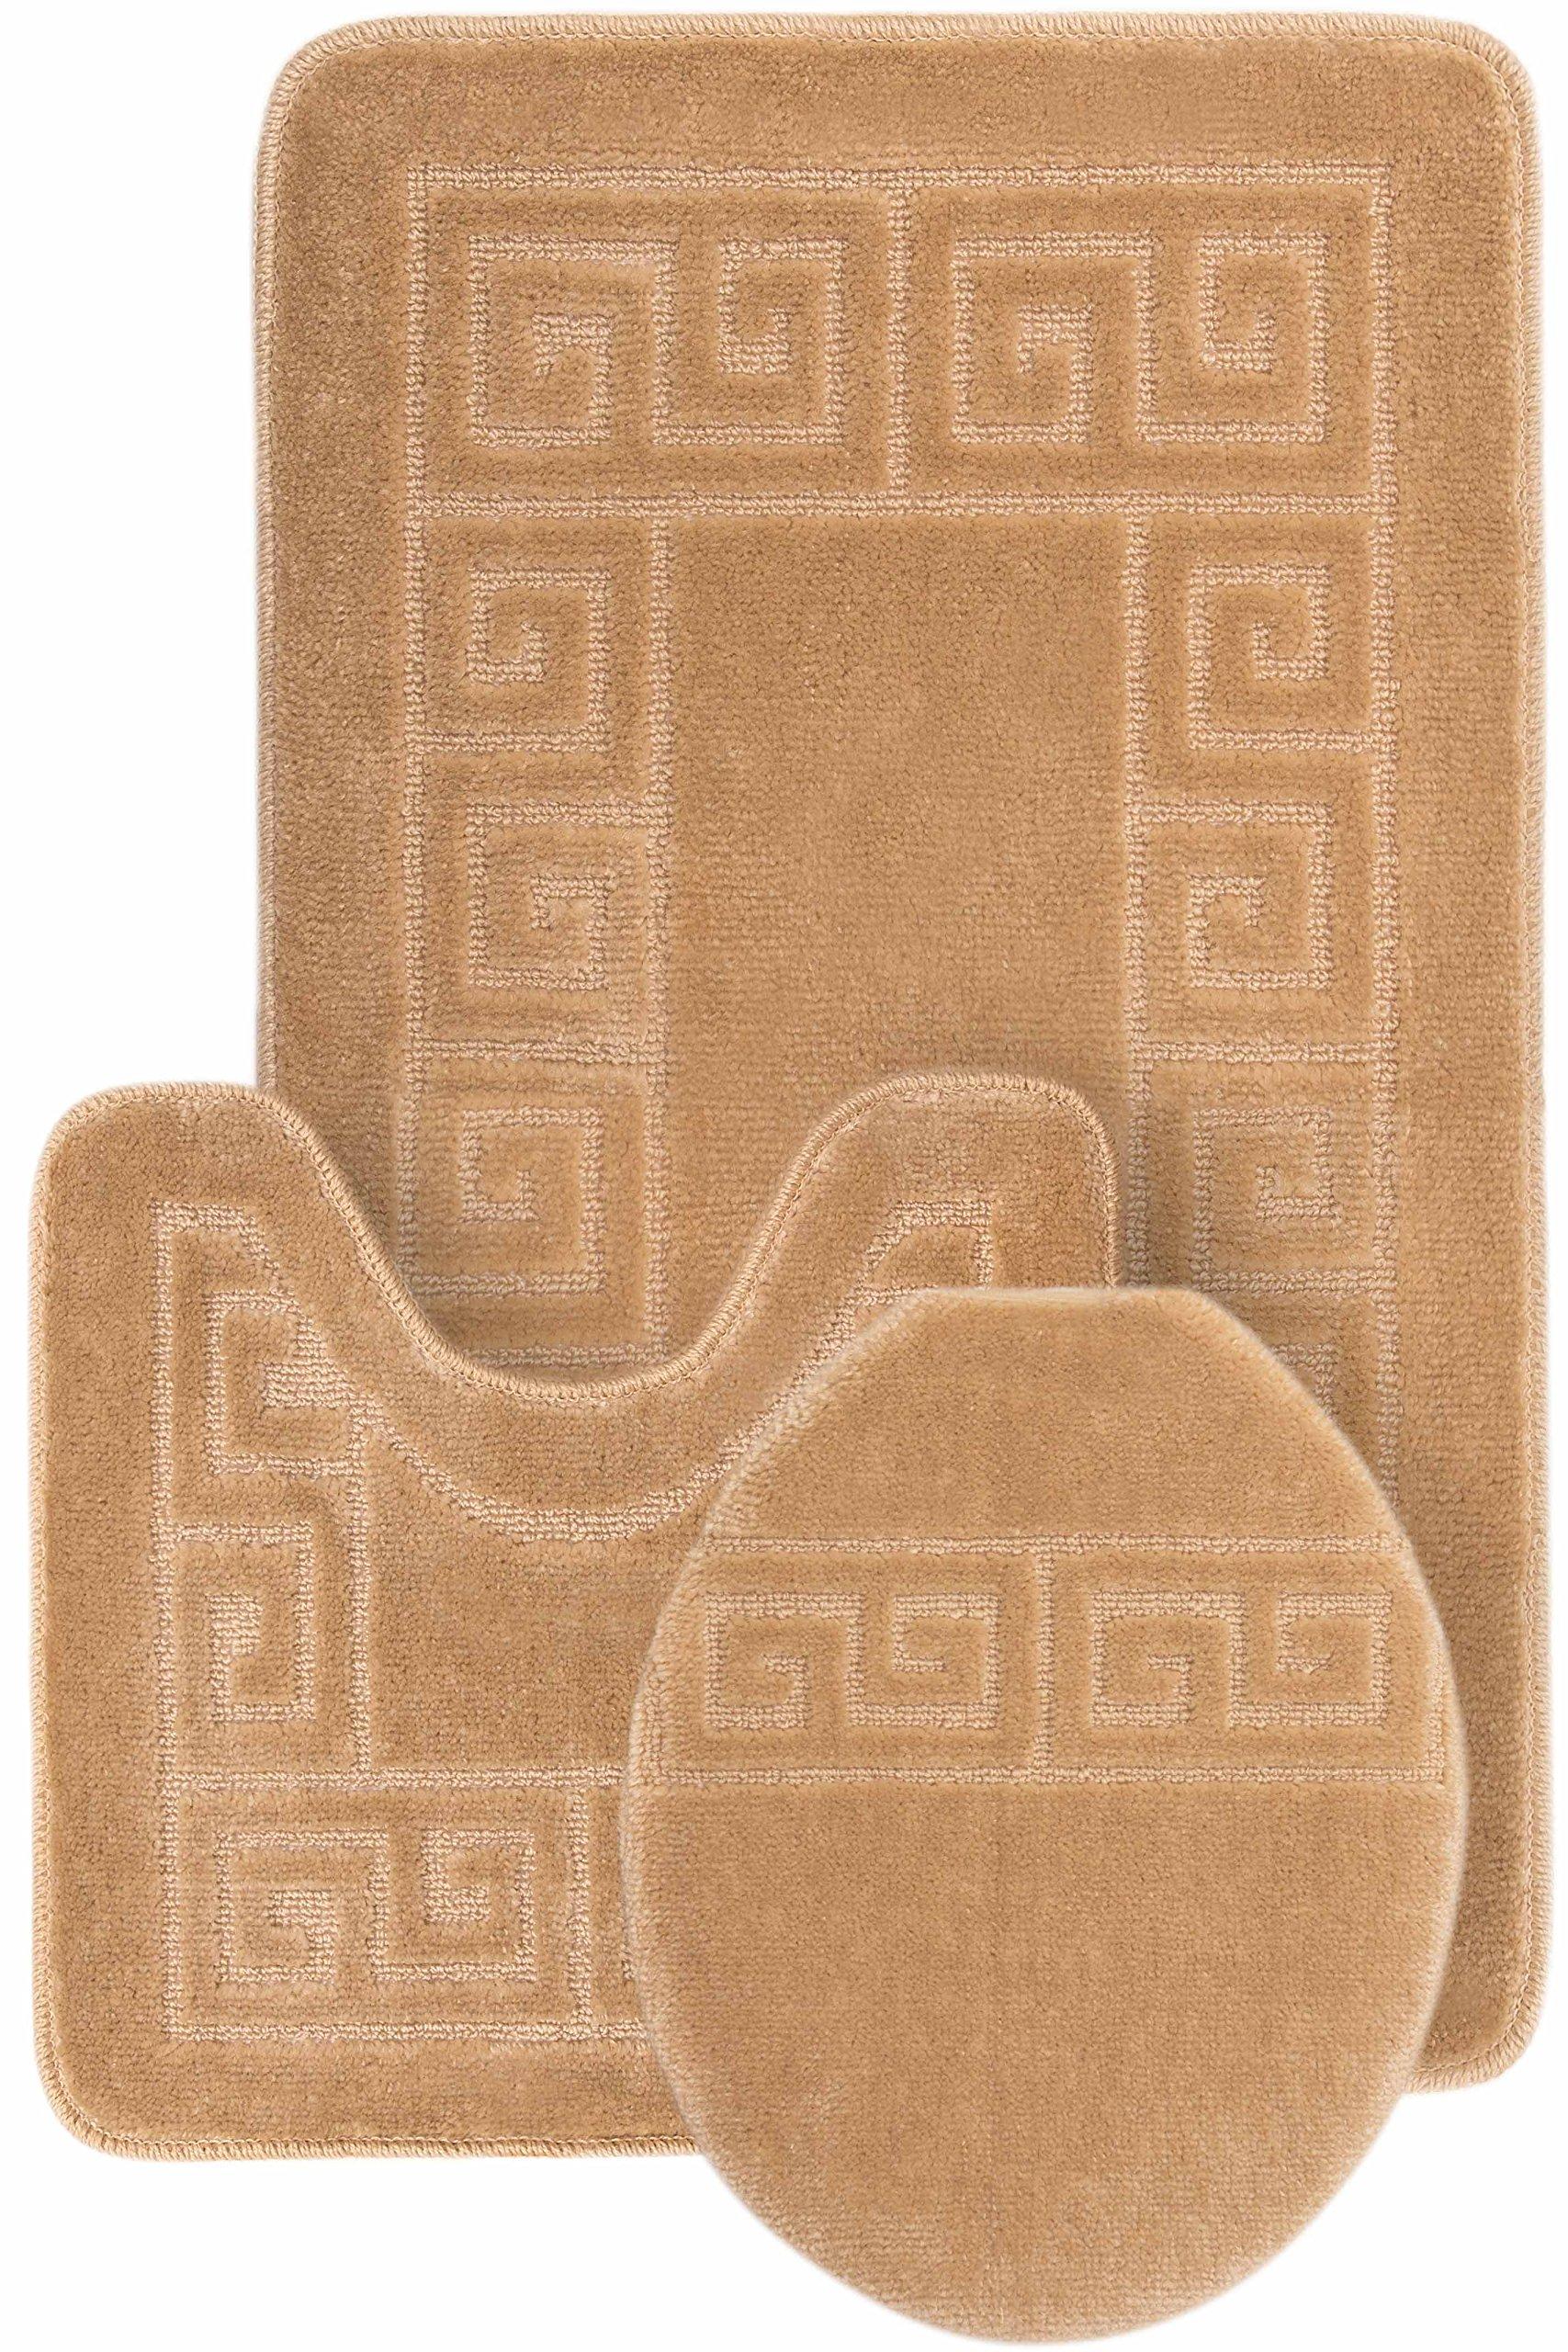 3 Piece Bath Rug Set Pattern Bathroom Rug (20''x32'')/large Contour Mat (20''x20'') with Lid Cover (Beige)